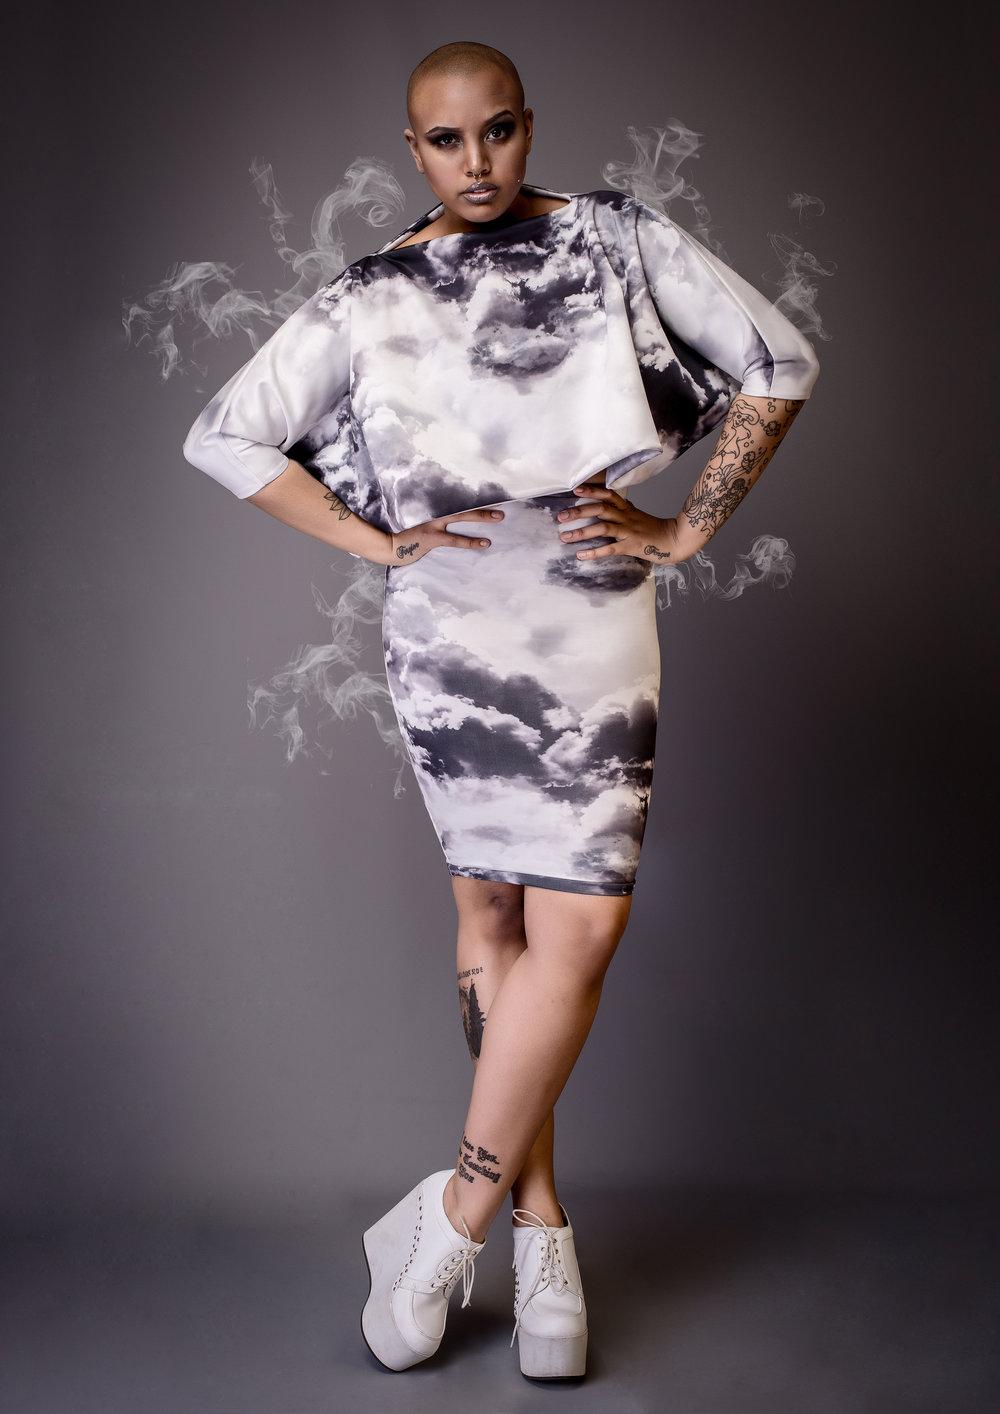 zaramia-ava-zaramiaava-leeds-fashion-designer-leedsfashiondesigner-stylist-leeds-stylist-leedsstylist-ethical-sustainable-minimalist-versatile-drape-wrap-grey-cowl-yoko-skirt-mika-top-cloud-1